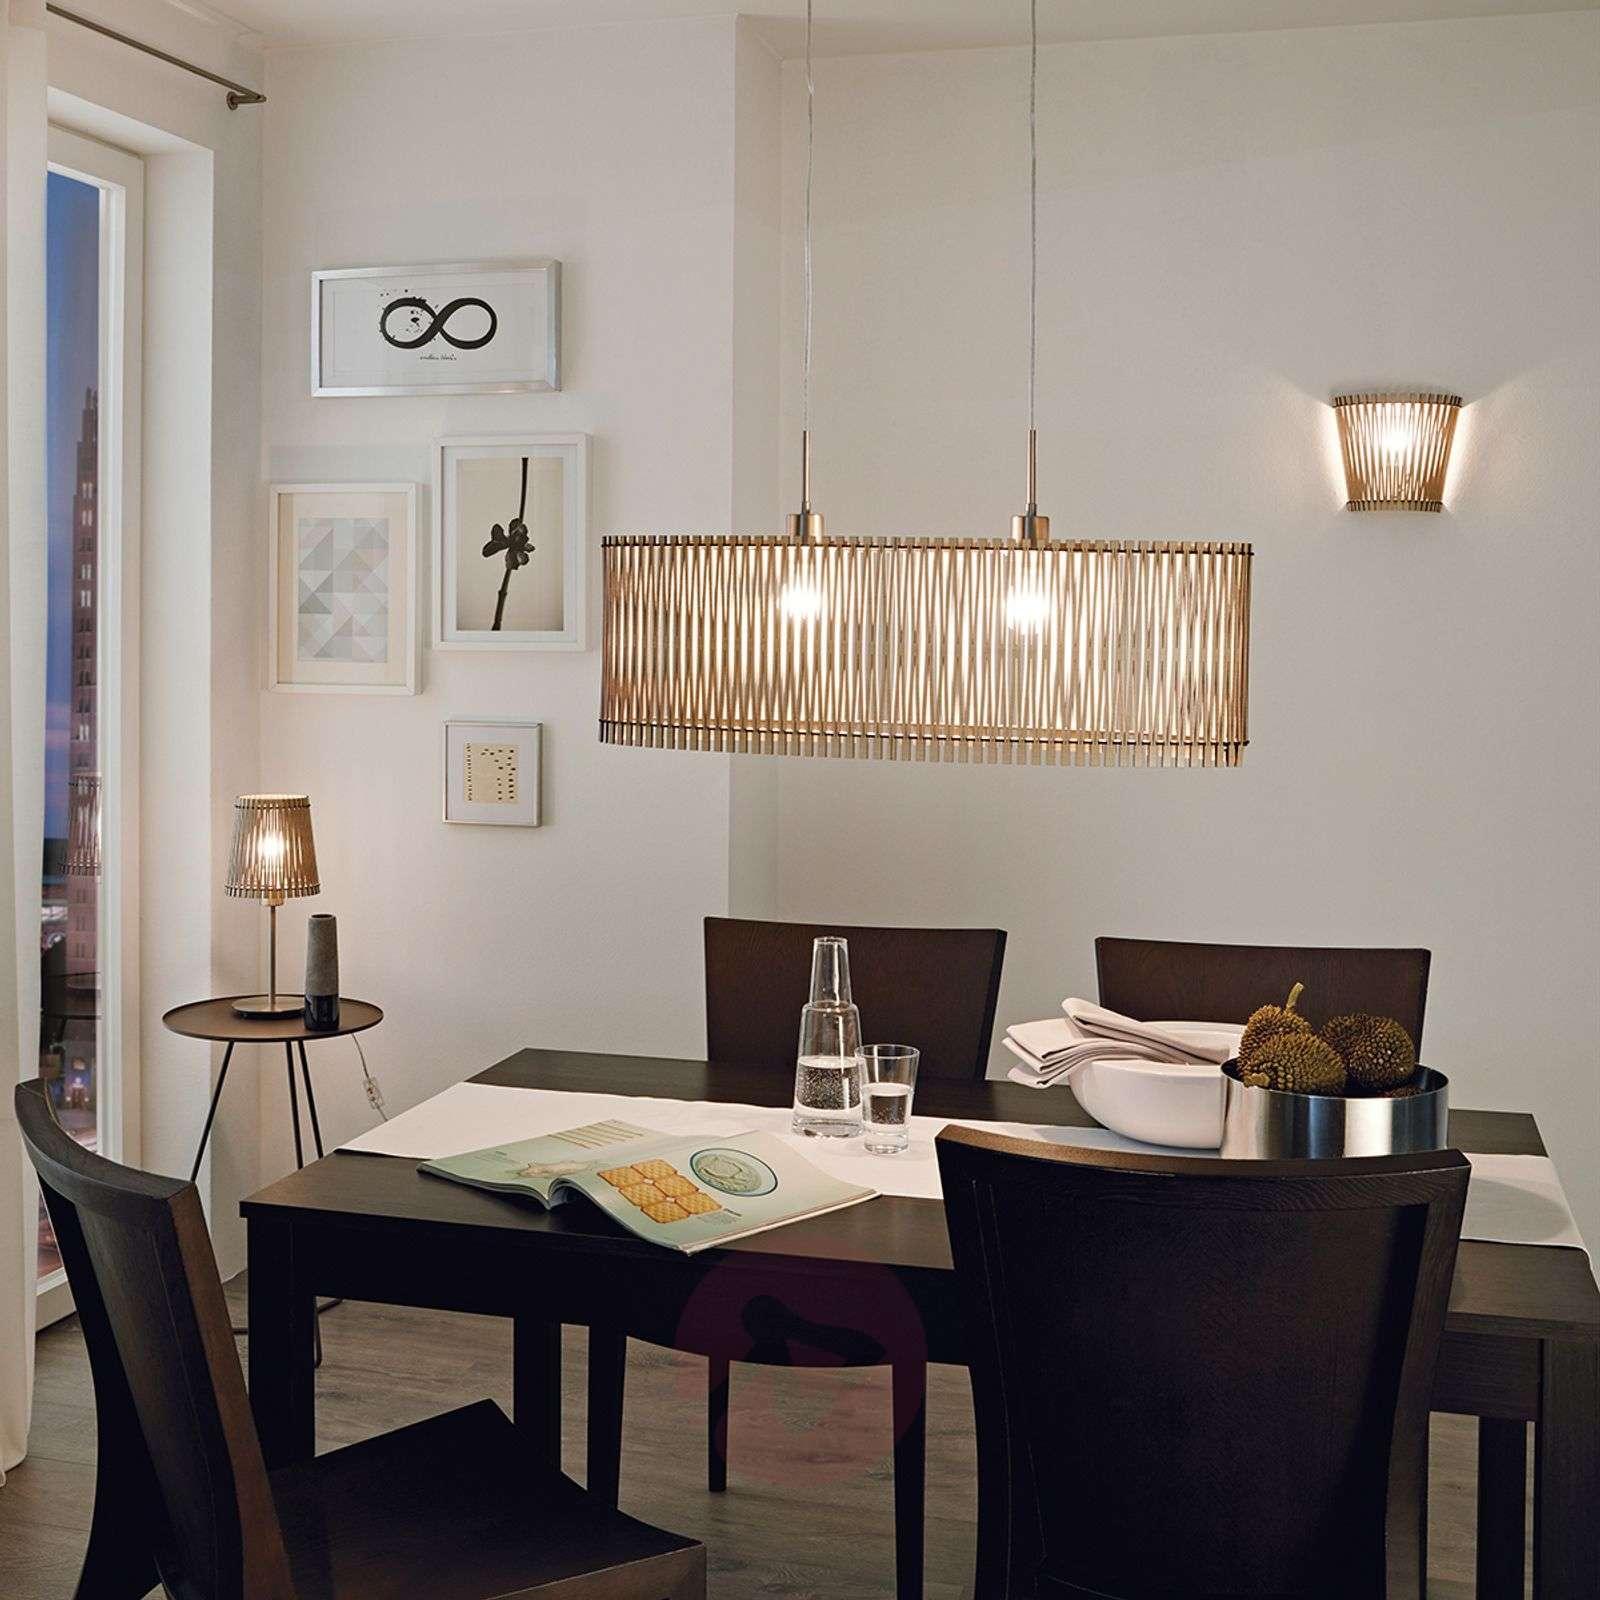 Sendero wooden pendant light with natural design-3031912-01